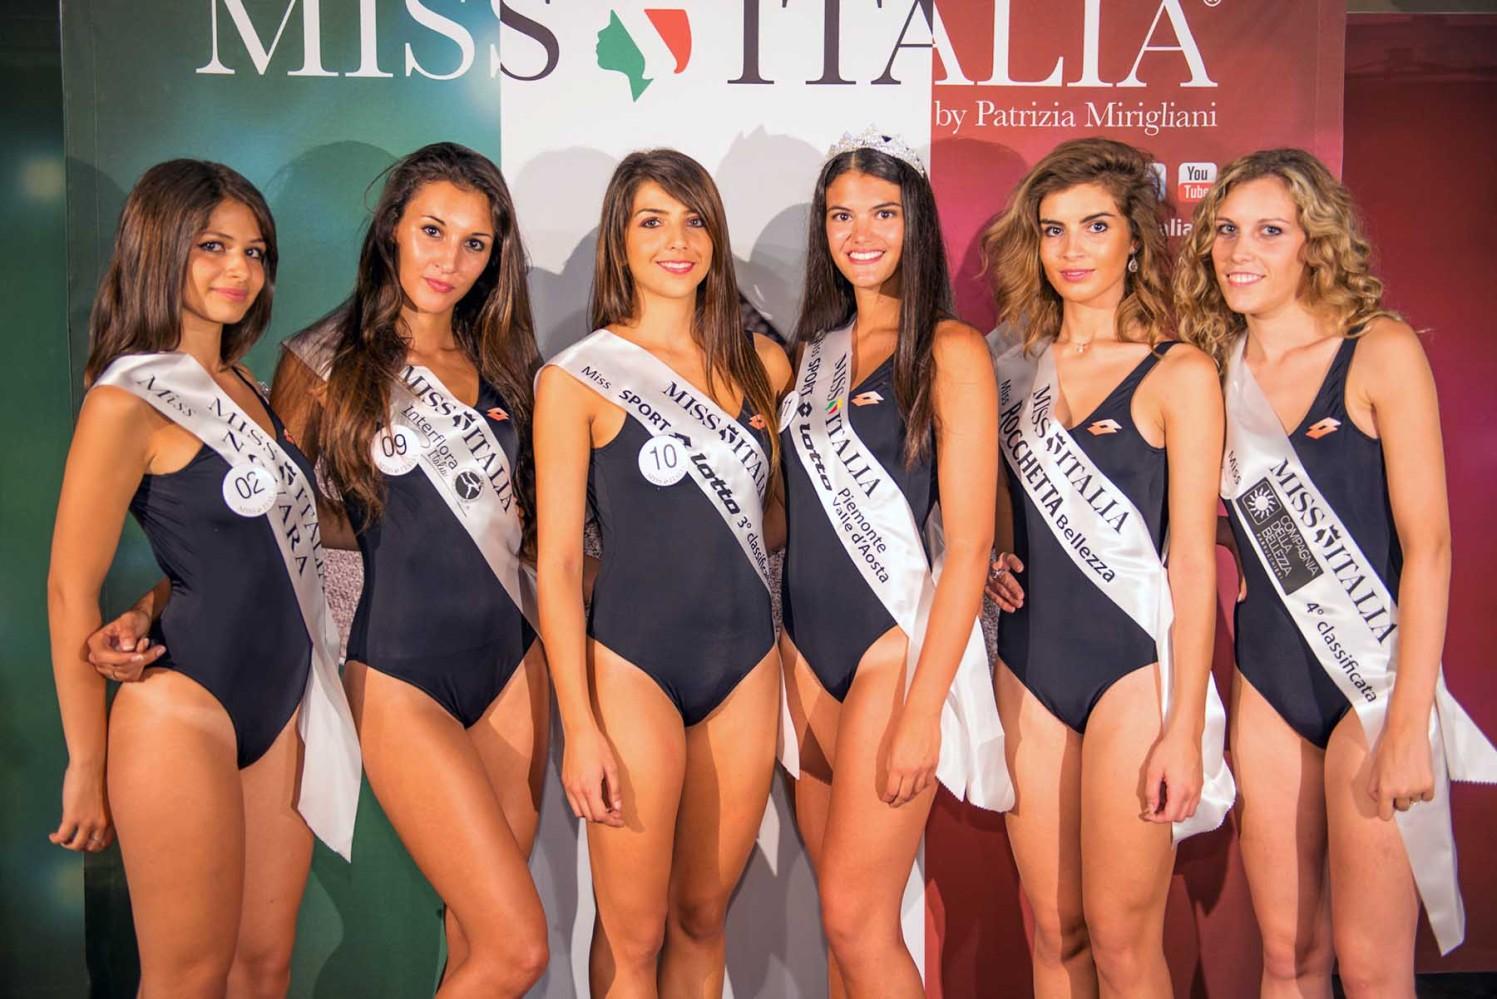 Francesca Sabbatino, Federica Seglie, Arianna Amodeo, Giulia Cordaro, Elisa Muriale, Erika Ambesi  (1)